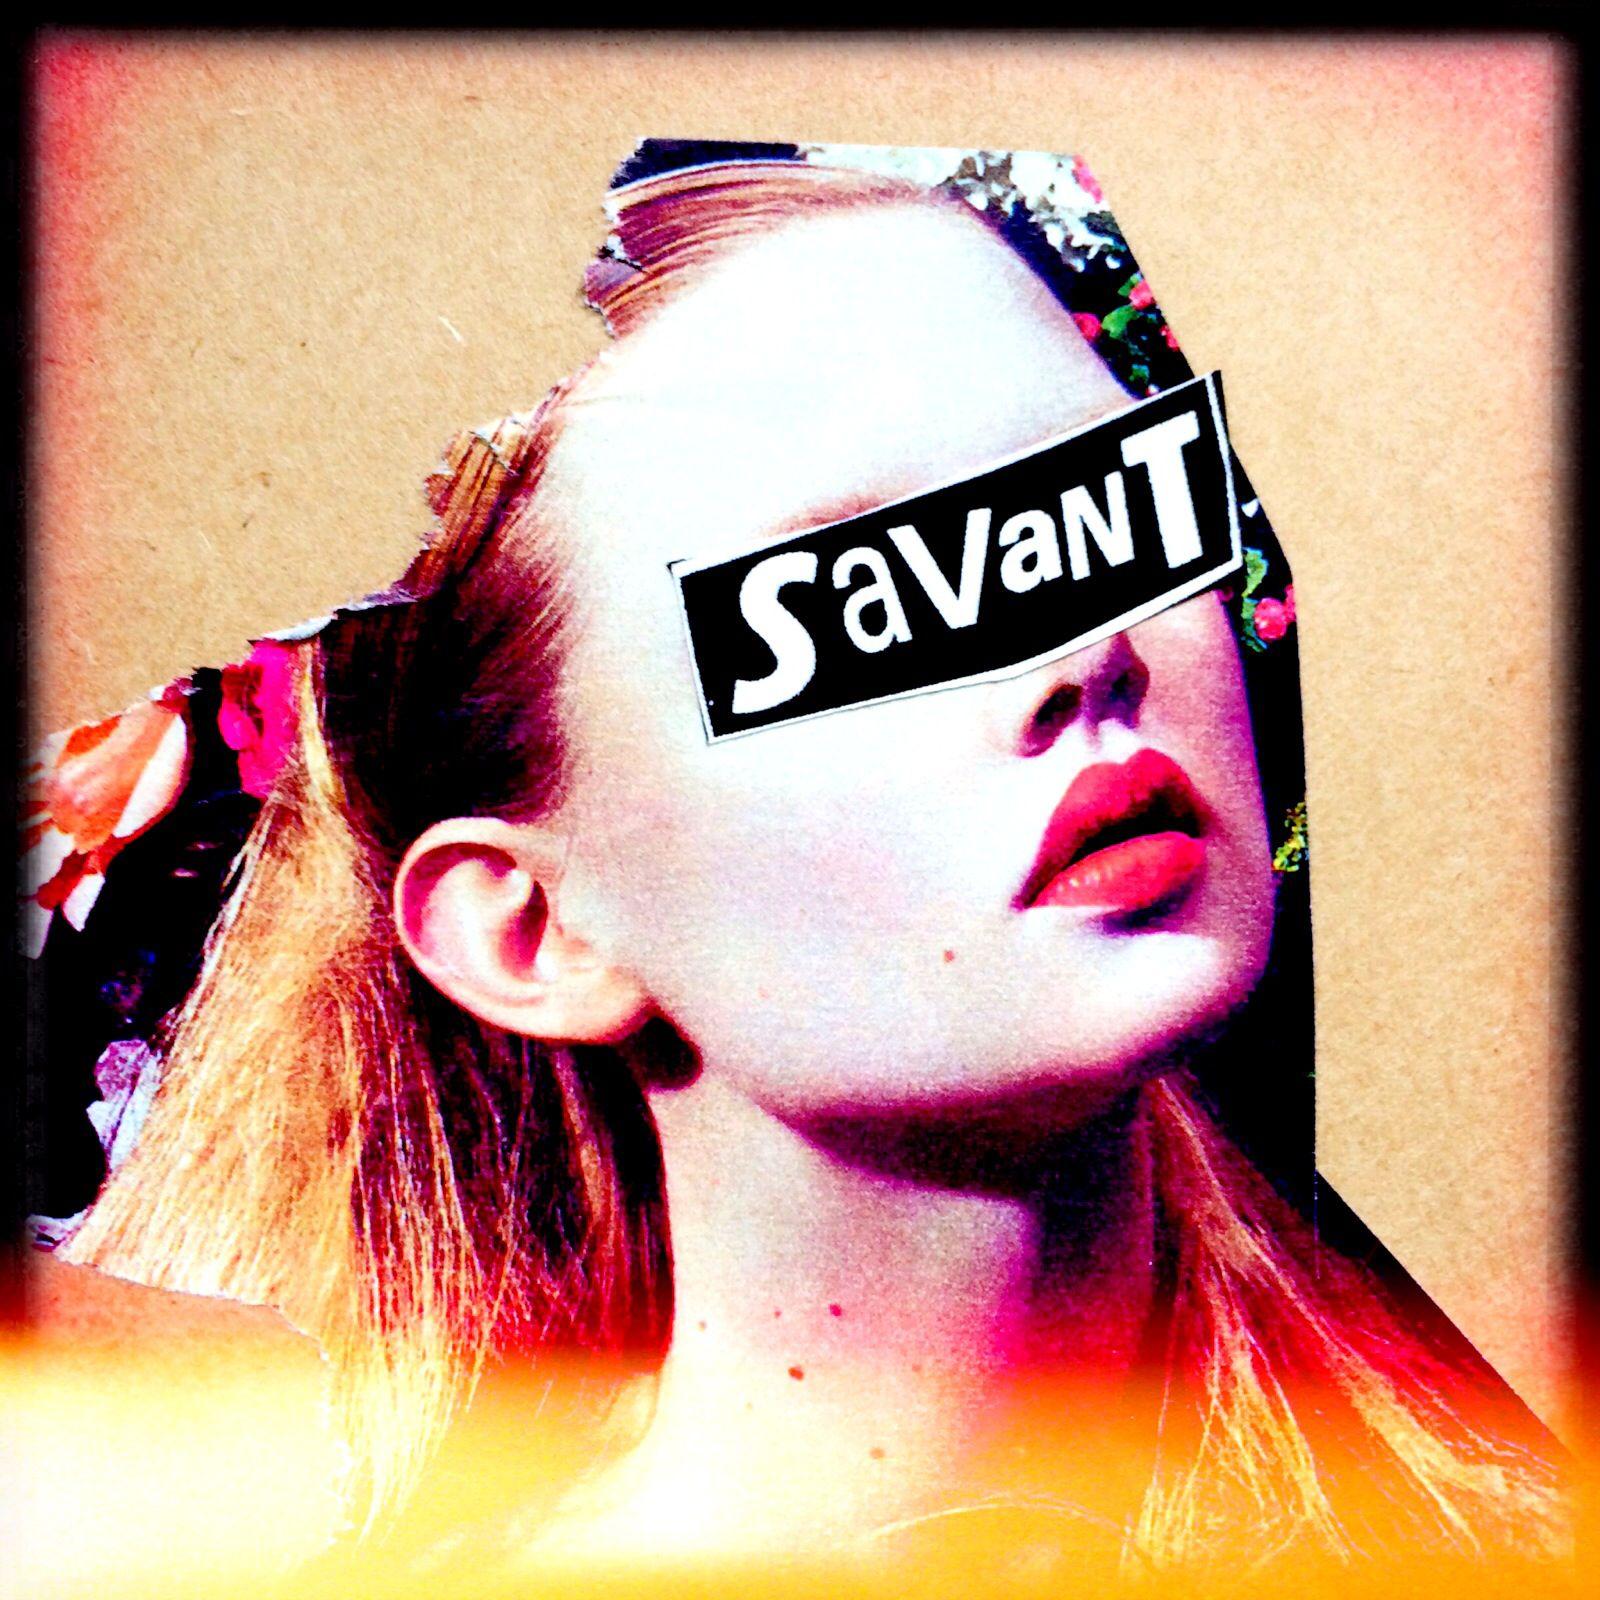 Savant collage